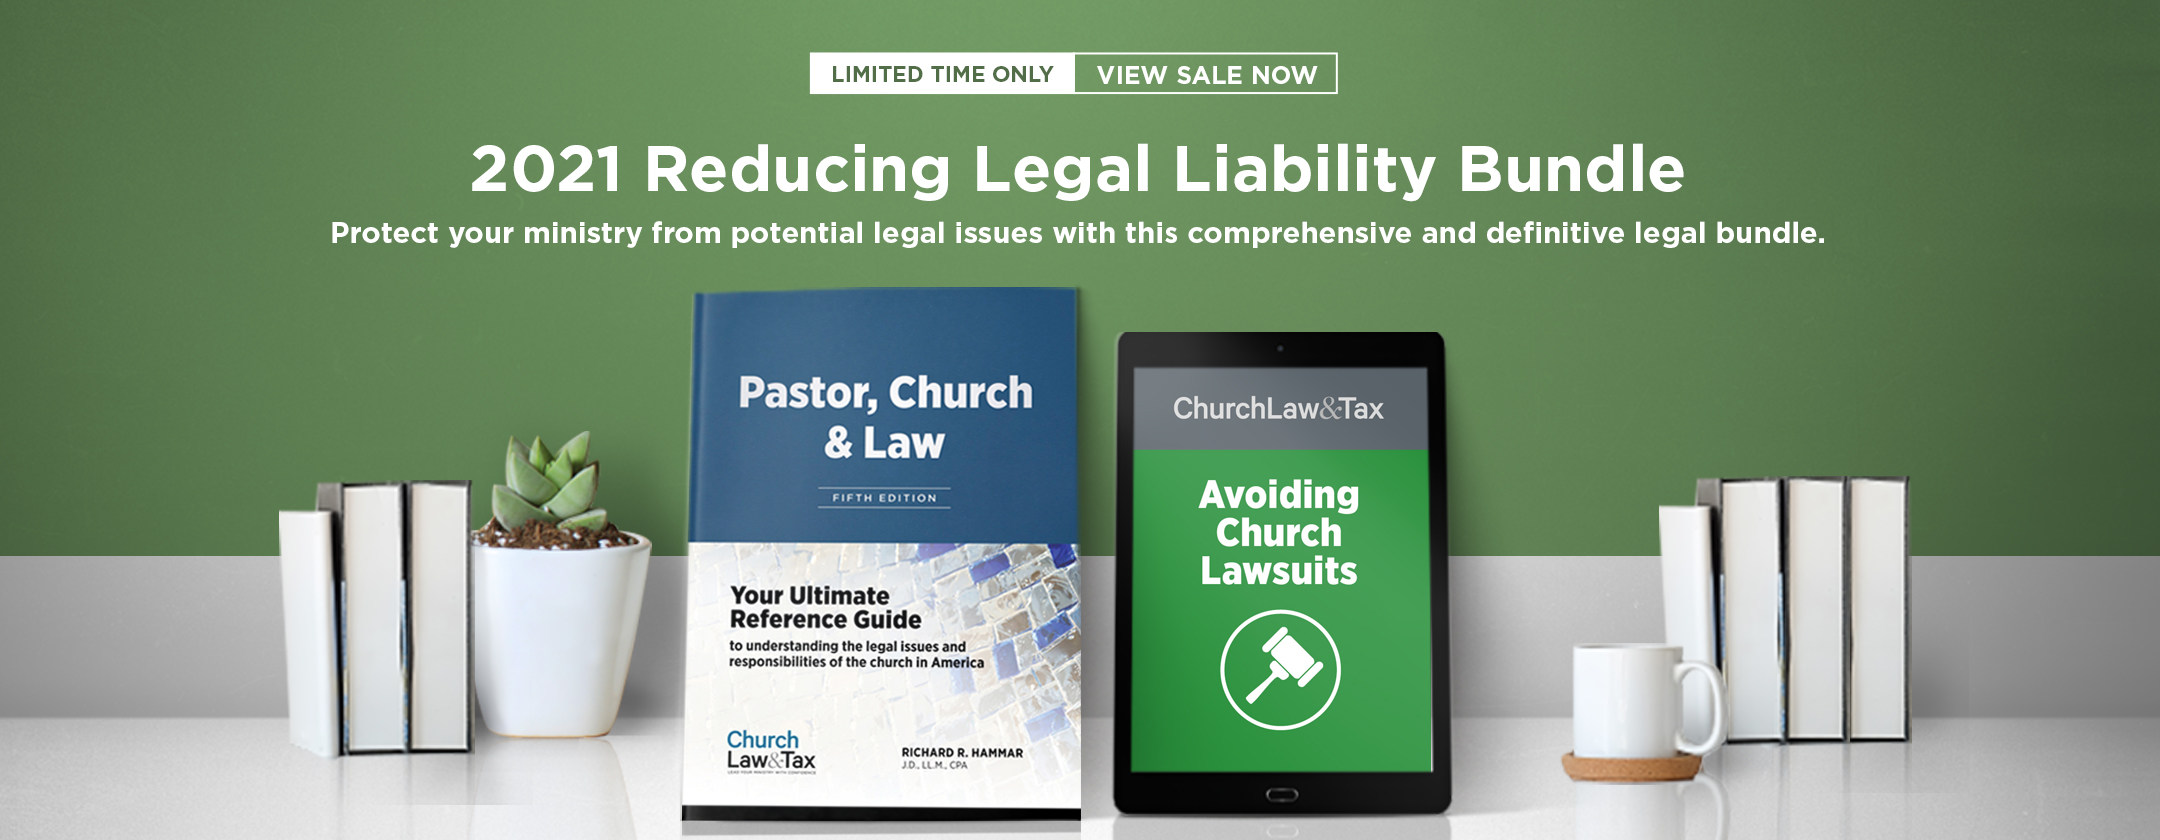 2021-lawsuit-prevention-bundle-store-carousel-banner.jpg